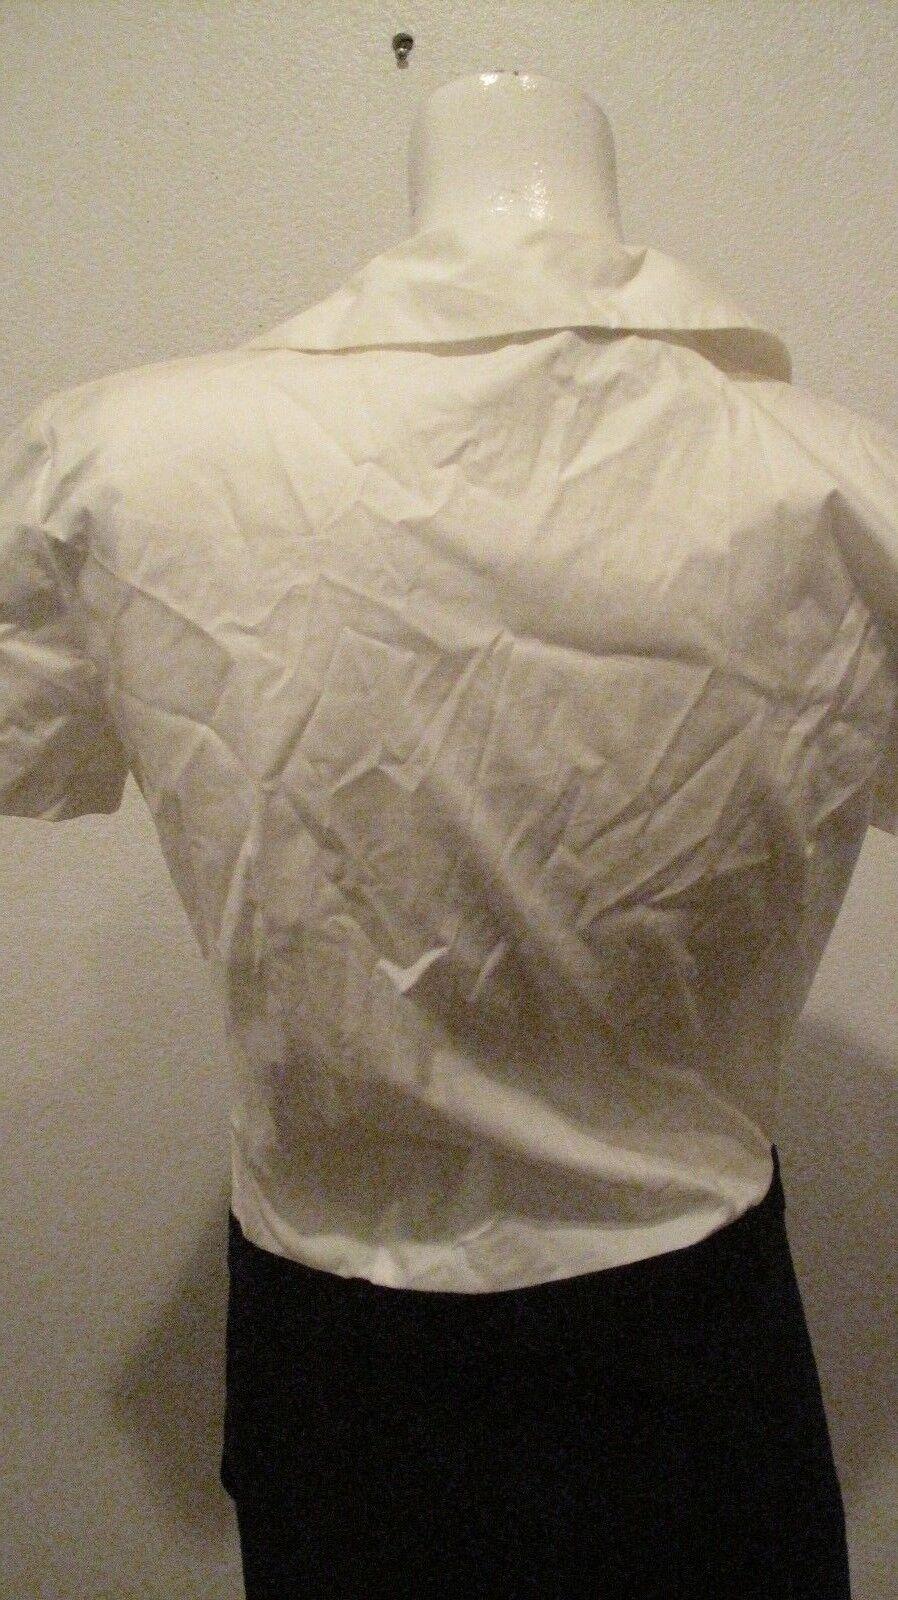 THEORY    NAMAS CANVAS WHITE NAVY SHORT SLEEVE DRESS MADE IN USA COTTON LYCRA SZ 4 13dfde